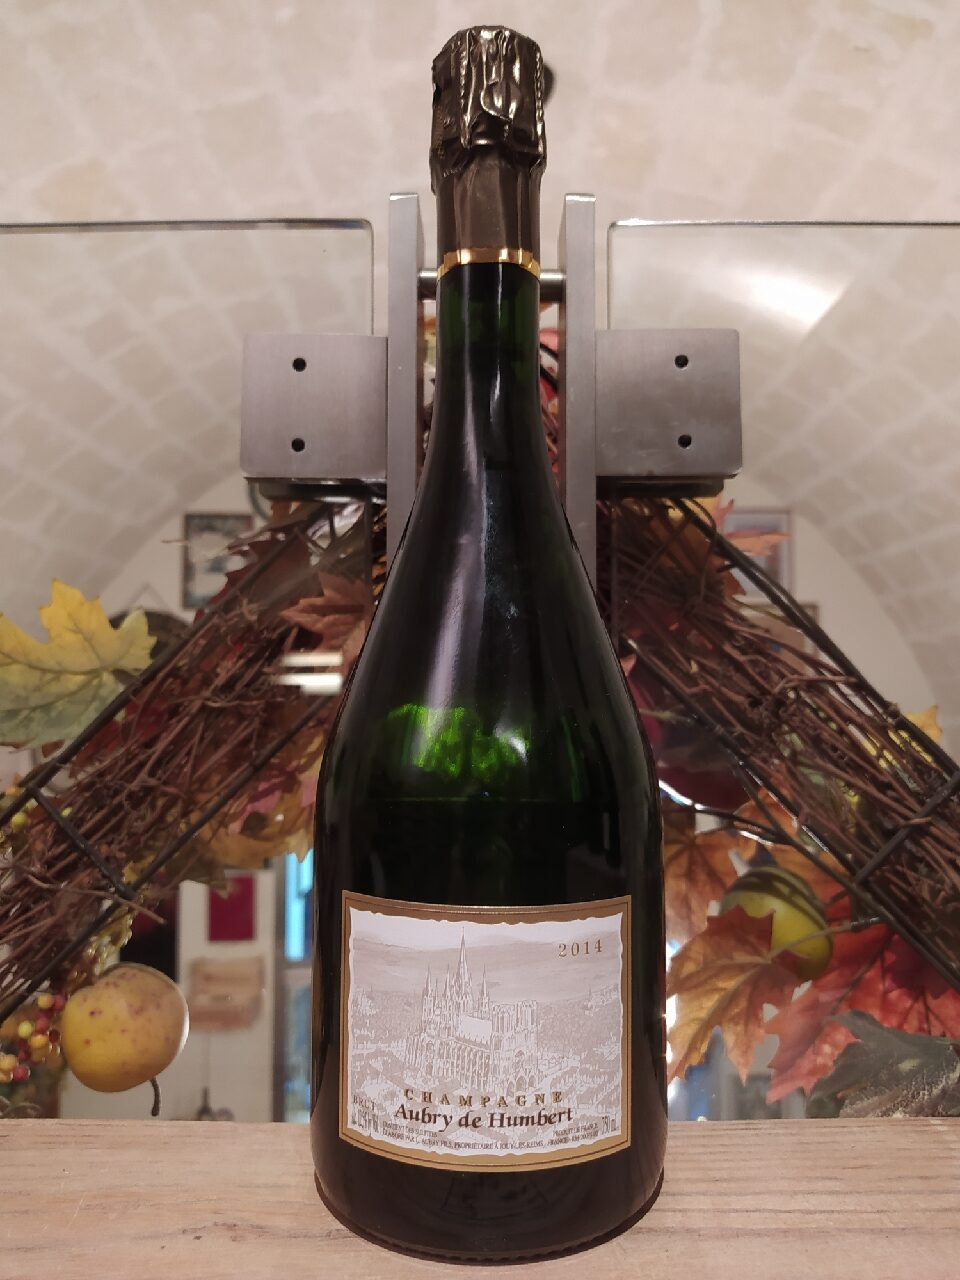 Aubry de Humbert Champagne Brut 2014